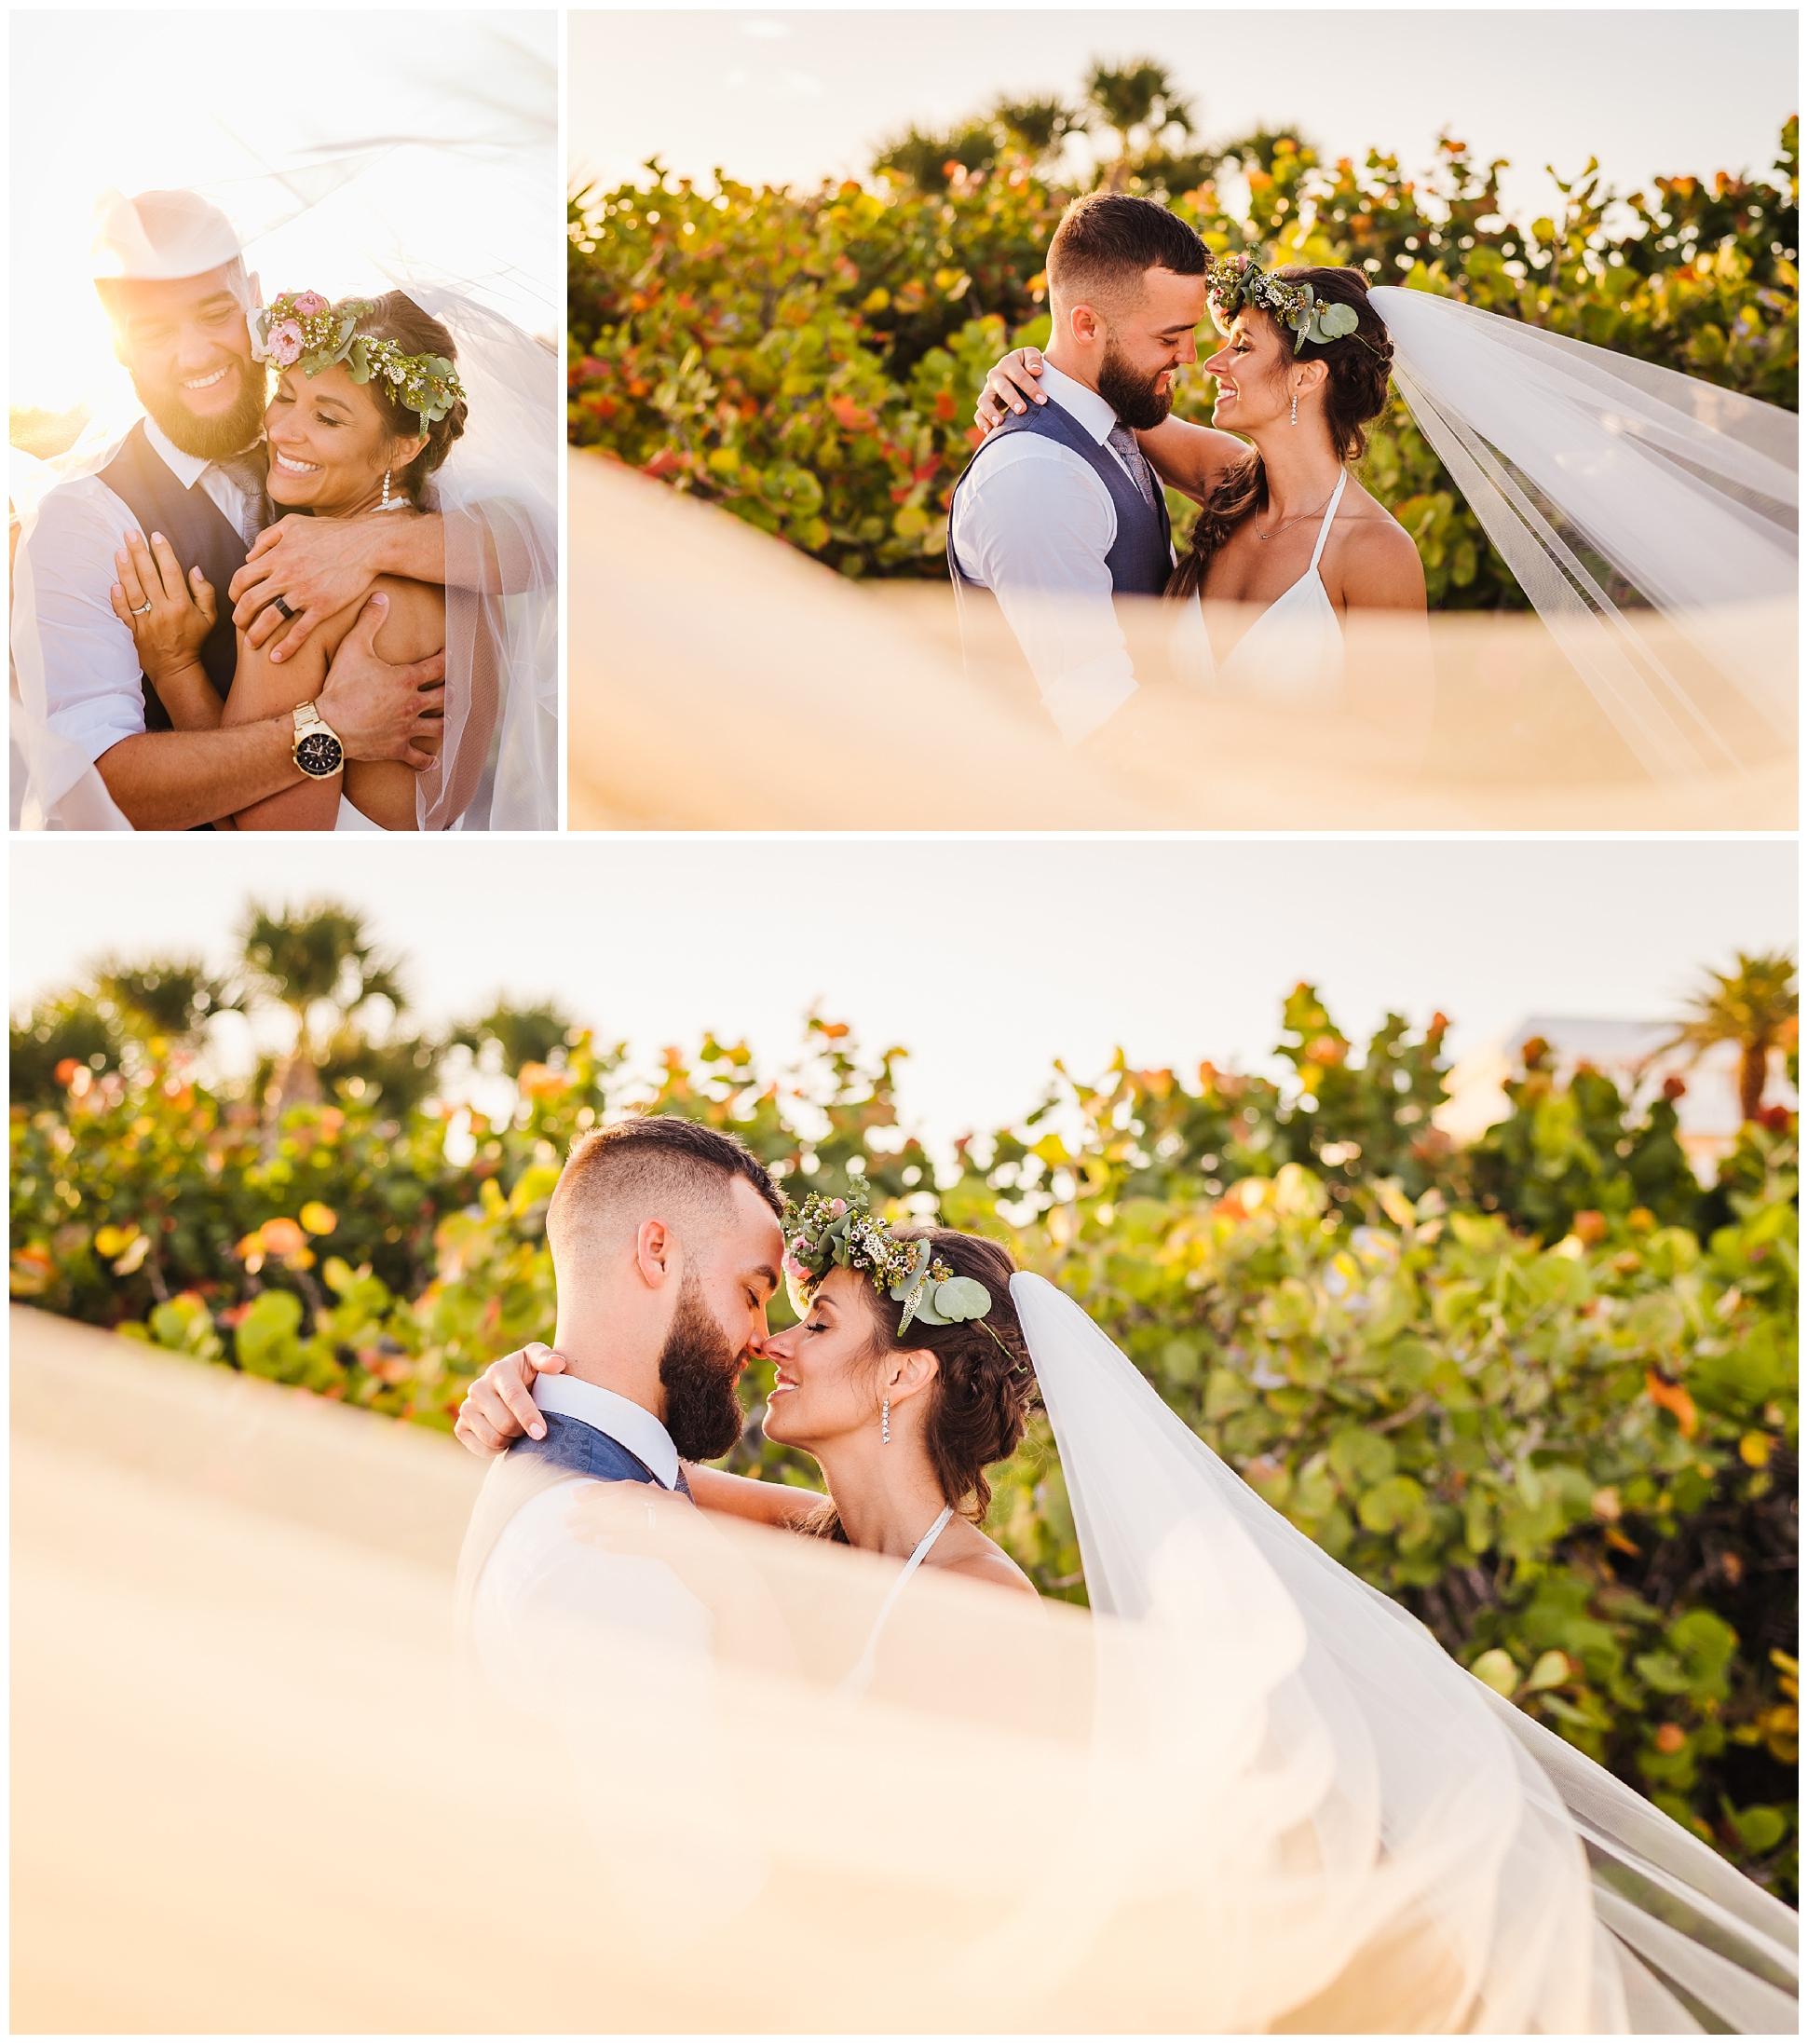 Tampa-wedding-photographer-vera-wang-flower-crown-post-card-inn_0035.jpg